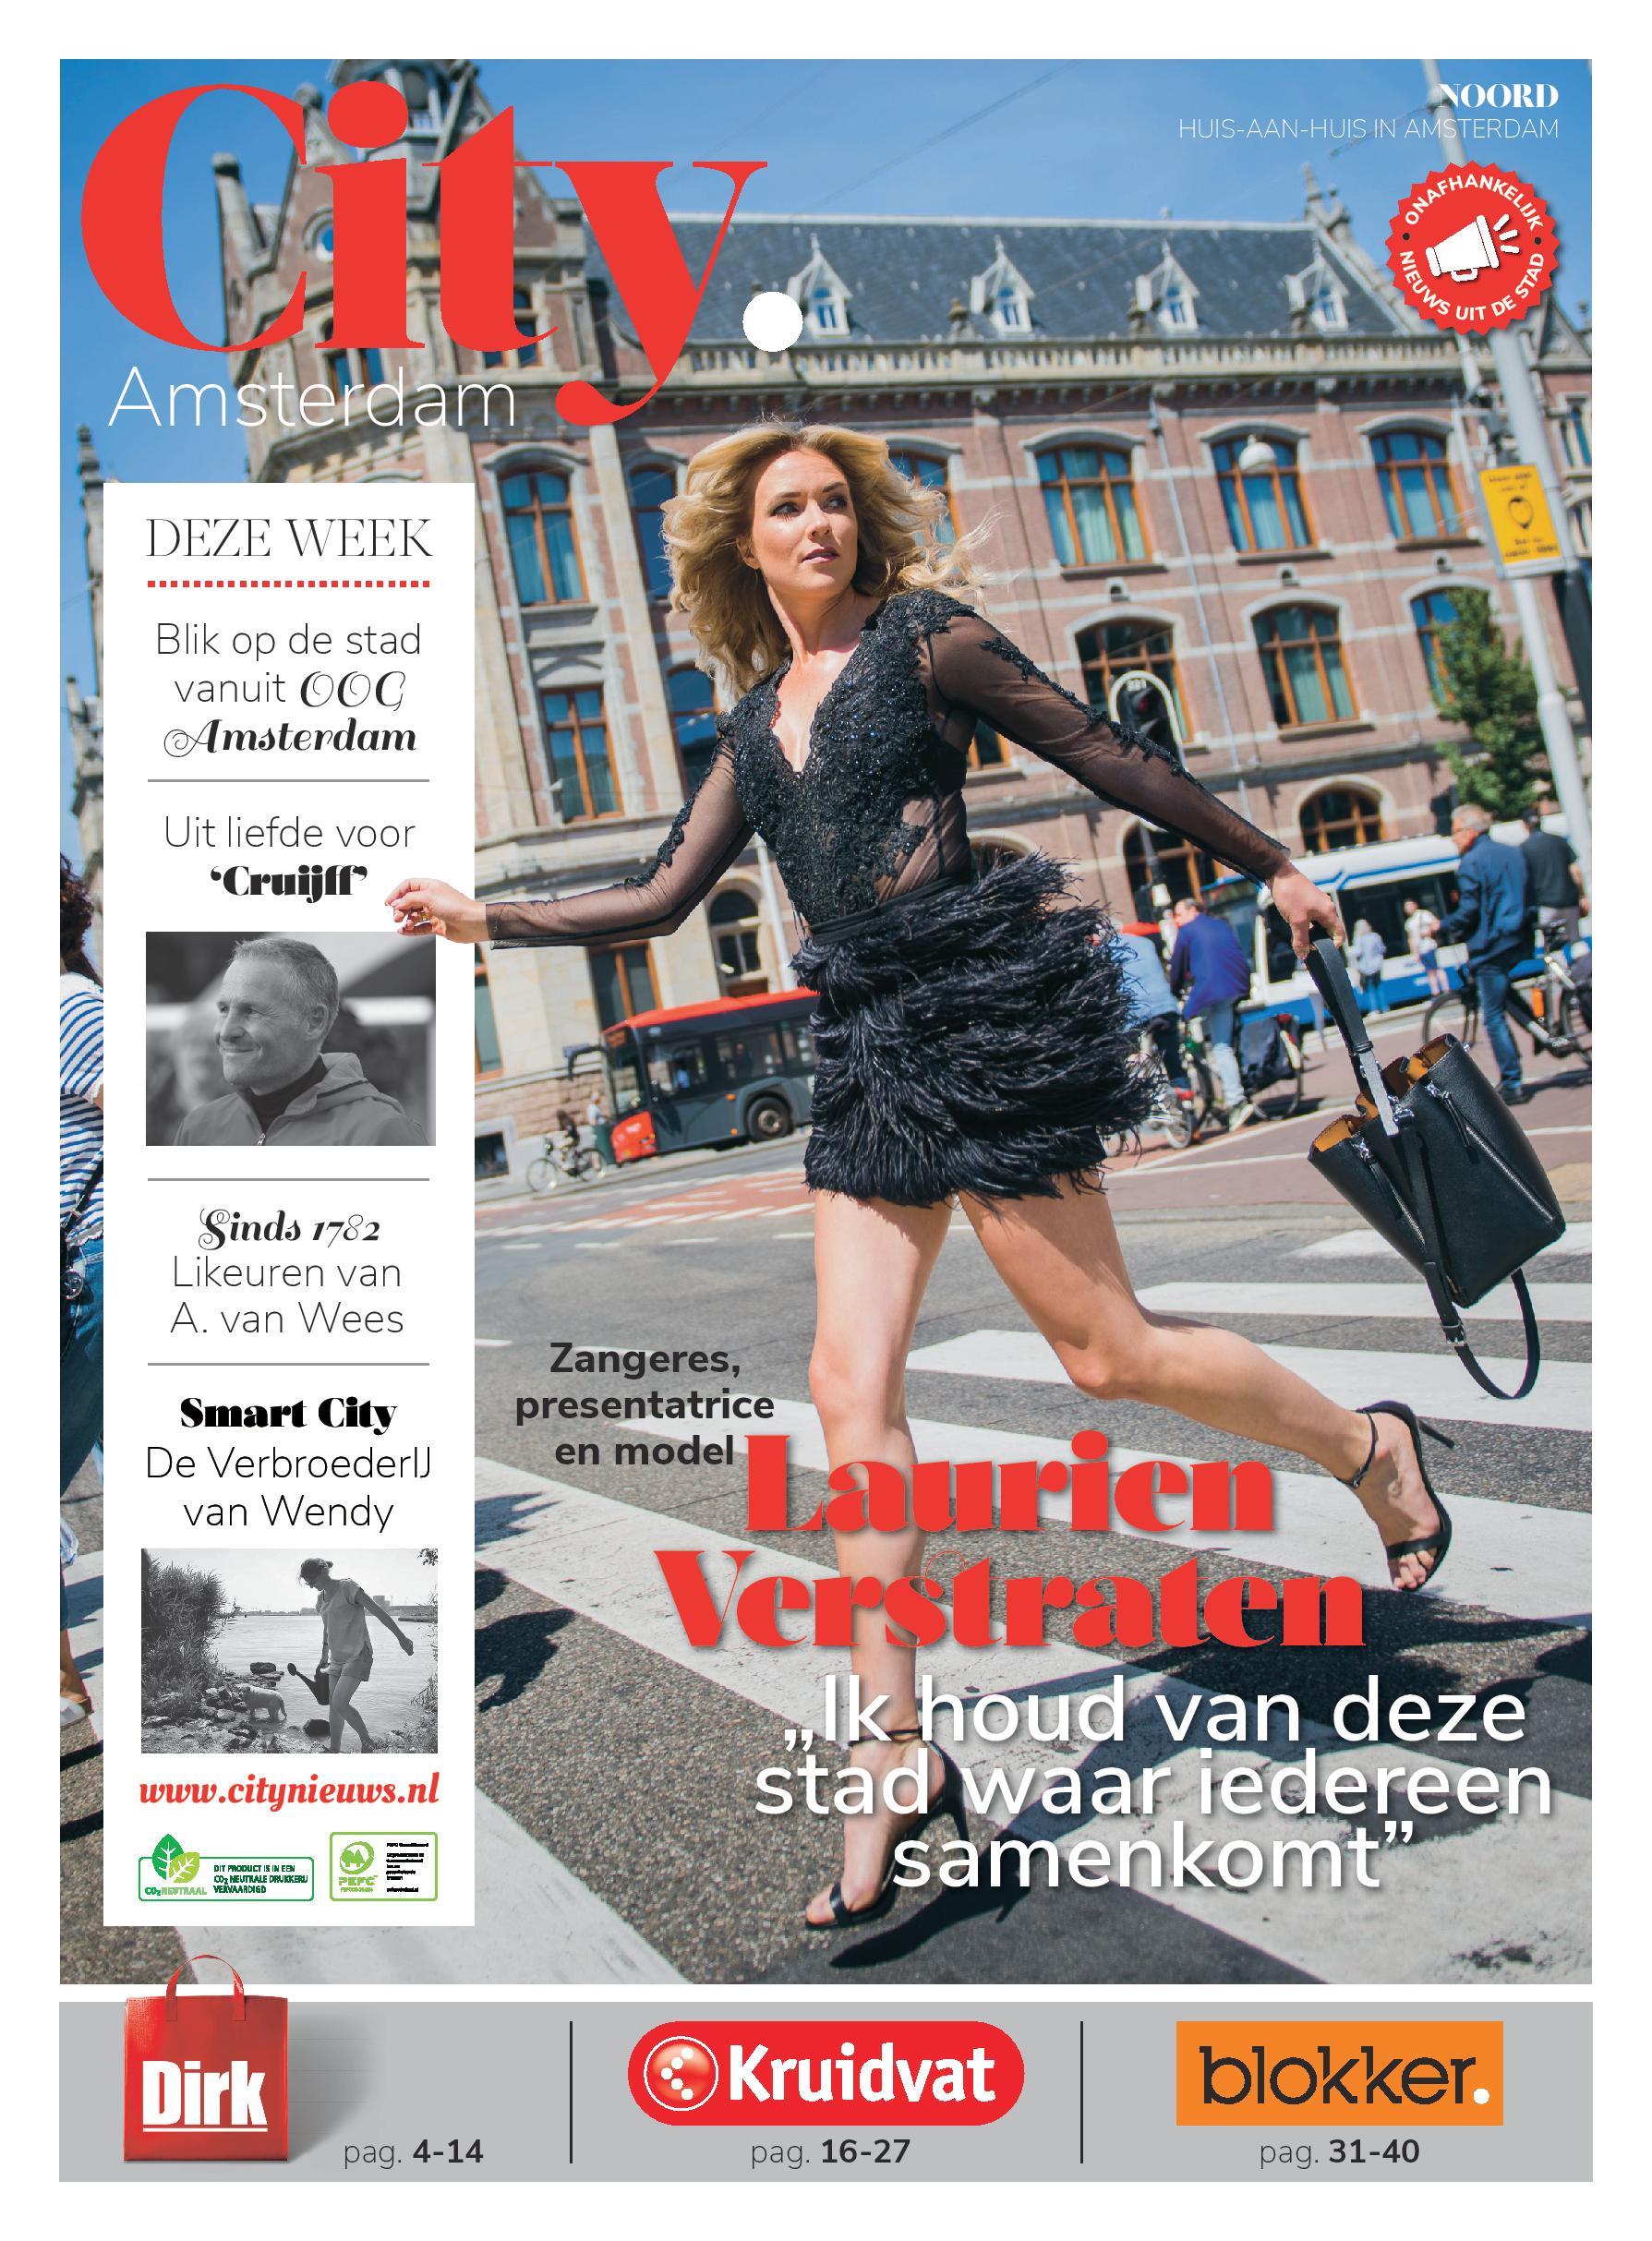 Cover City - Amsterdam, voor het Conservatorium Hotel